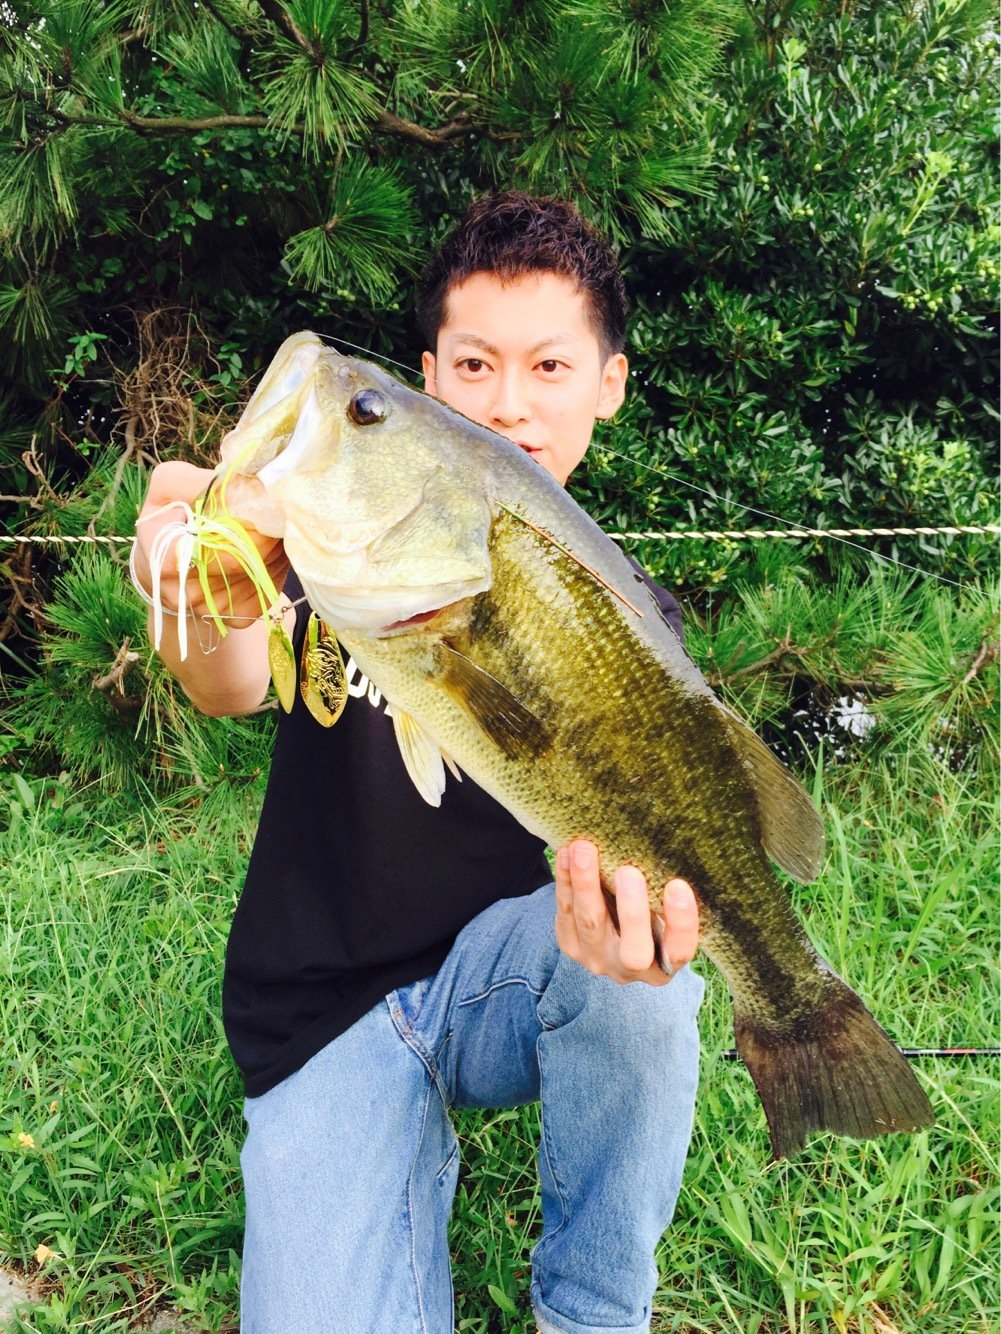 YuichiroHondaさんの投稿画像,写っている魚はブラックバス